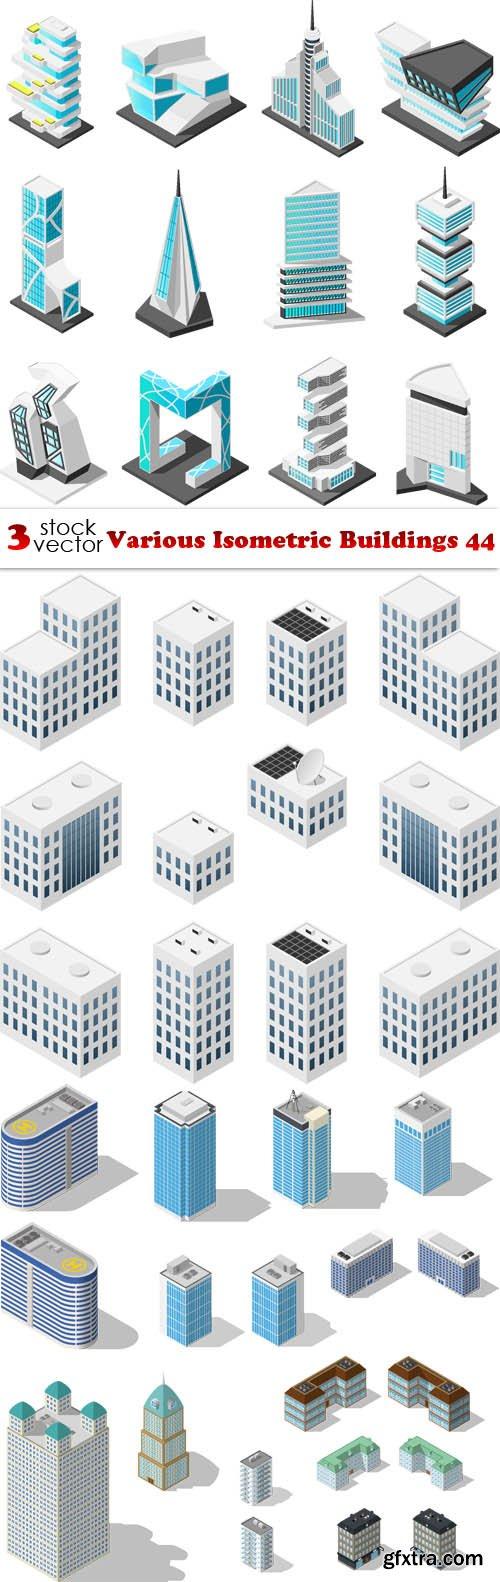 Vectors - Various Isometric Buildings 44